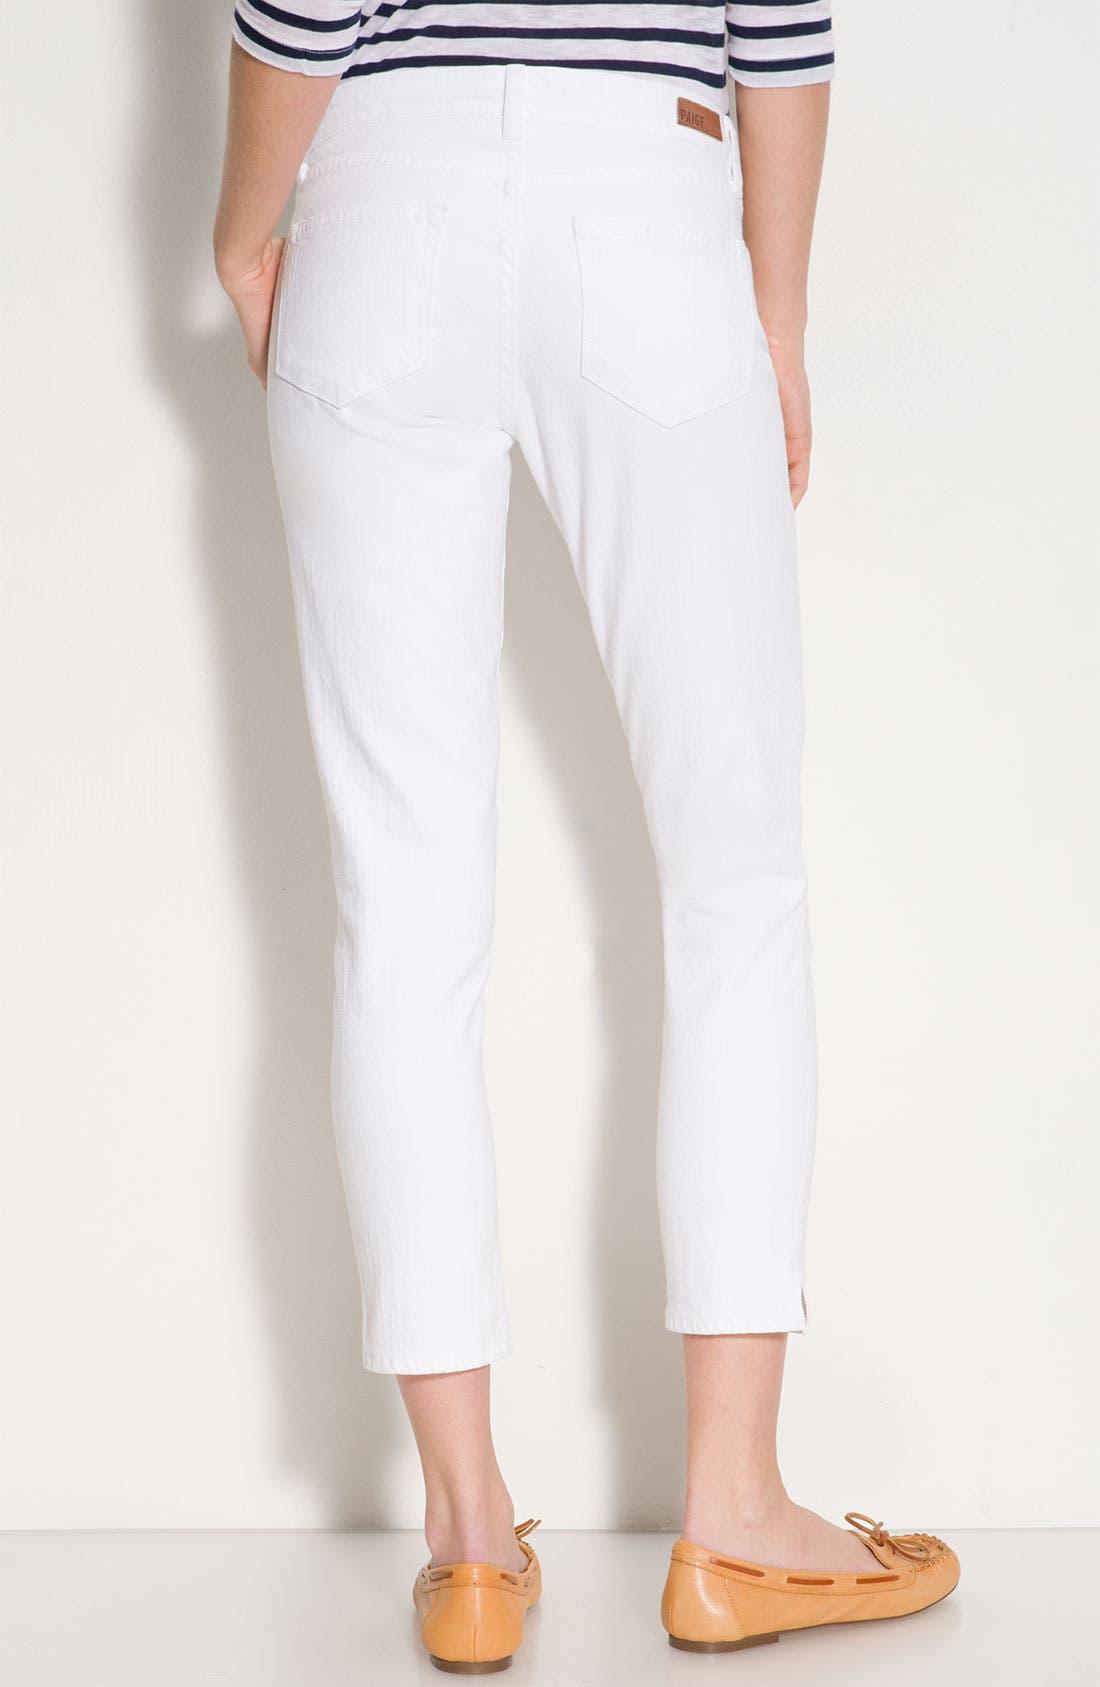 Main Image - Paige Denim 'Kylie' Crop Skinny Jeans (Optic White Wash)